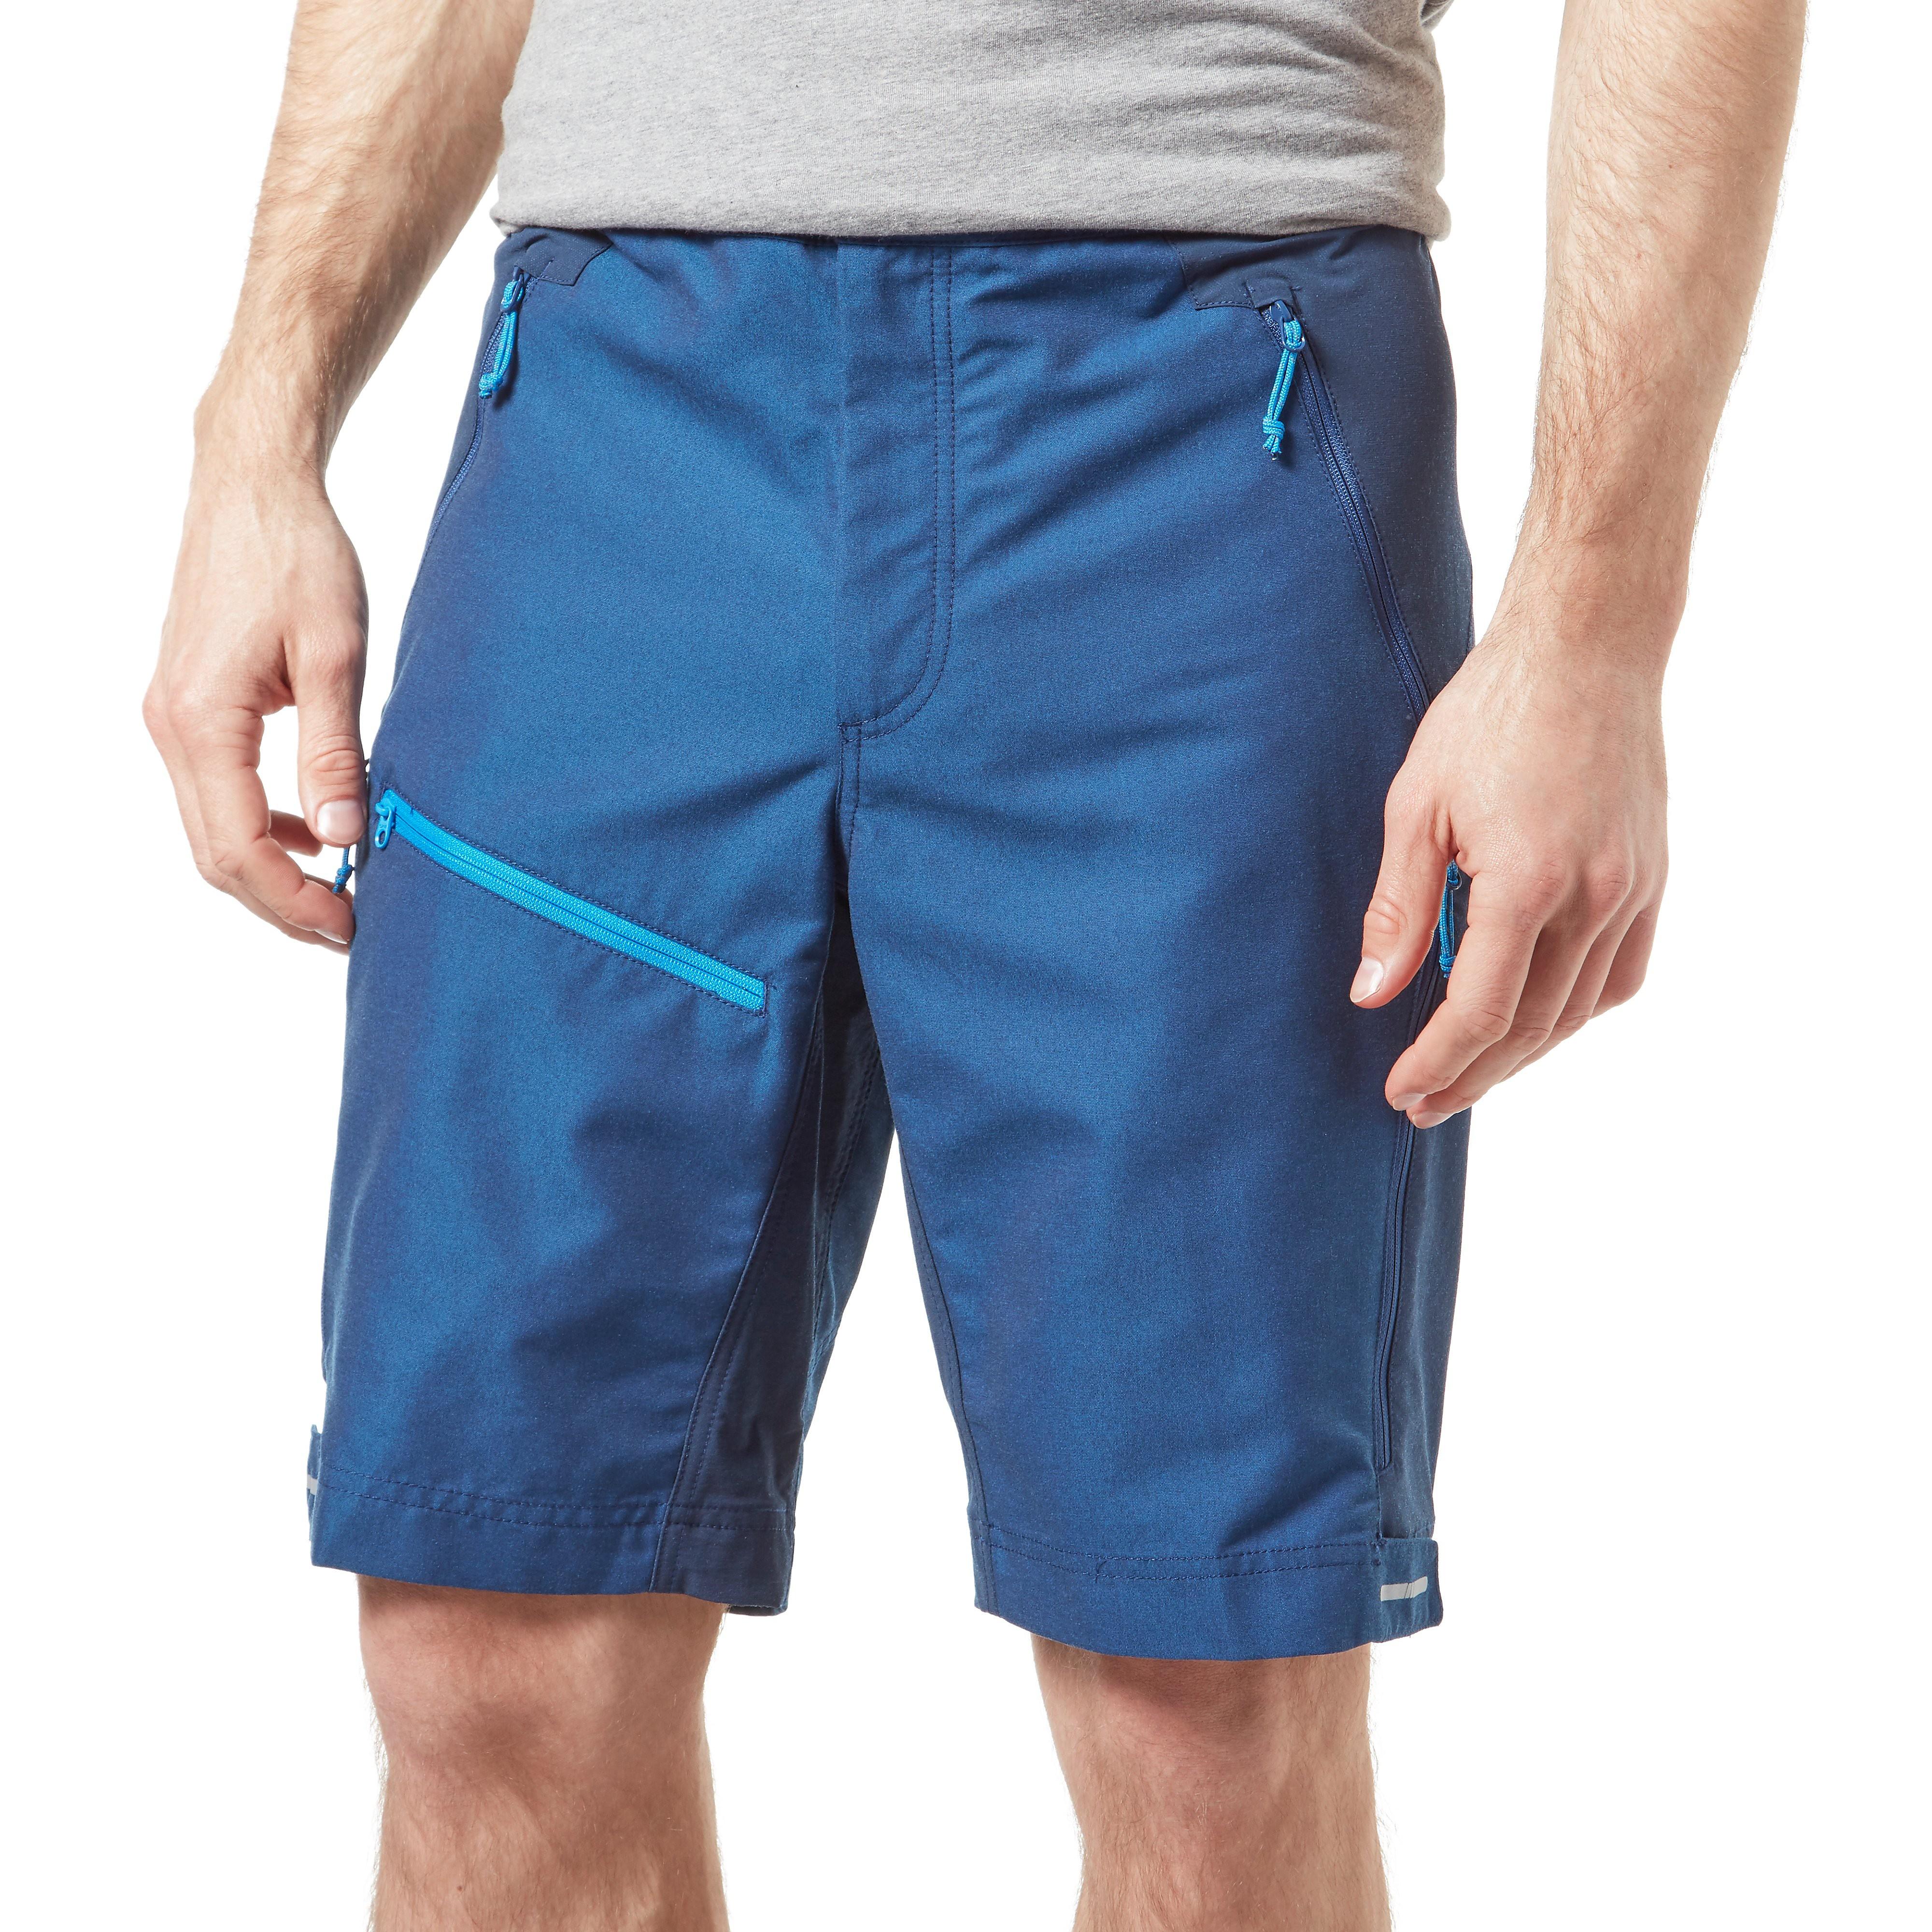 Berghaus Baggy Men's Shorts